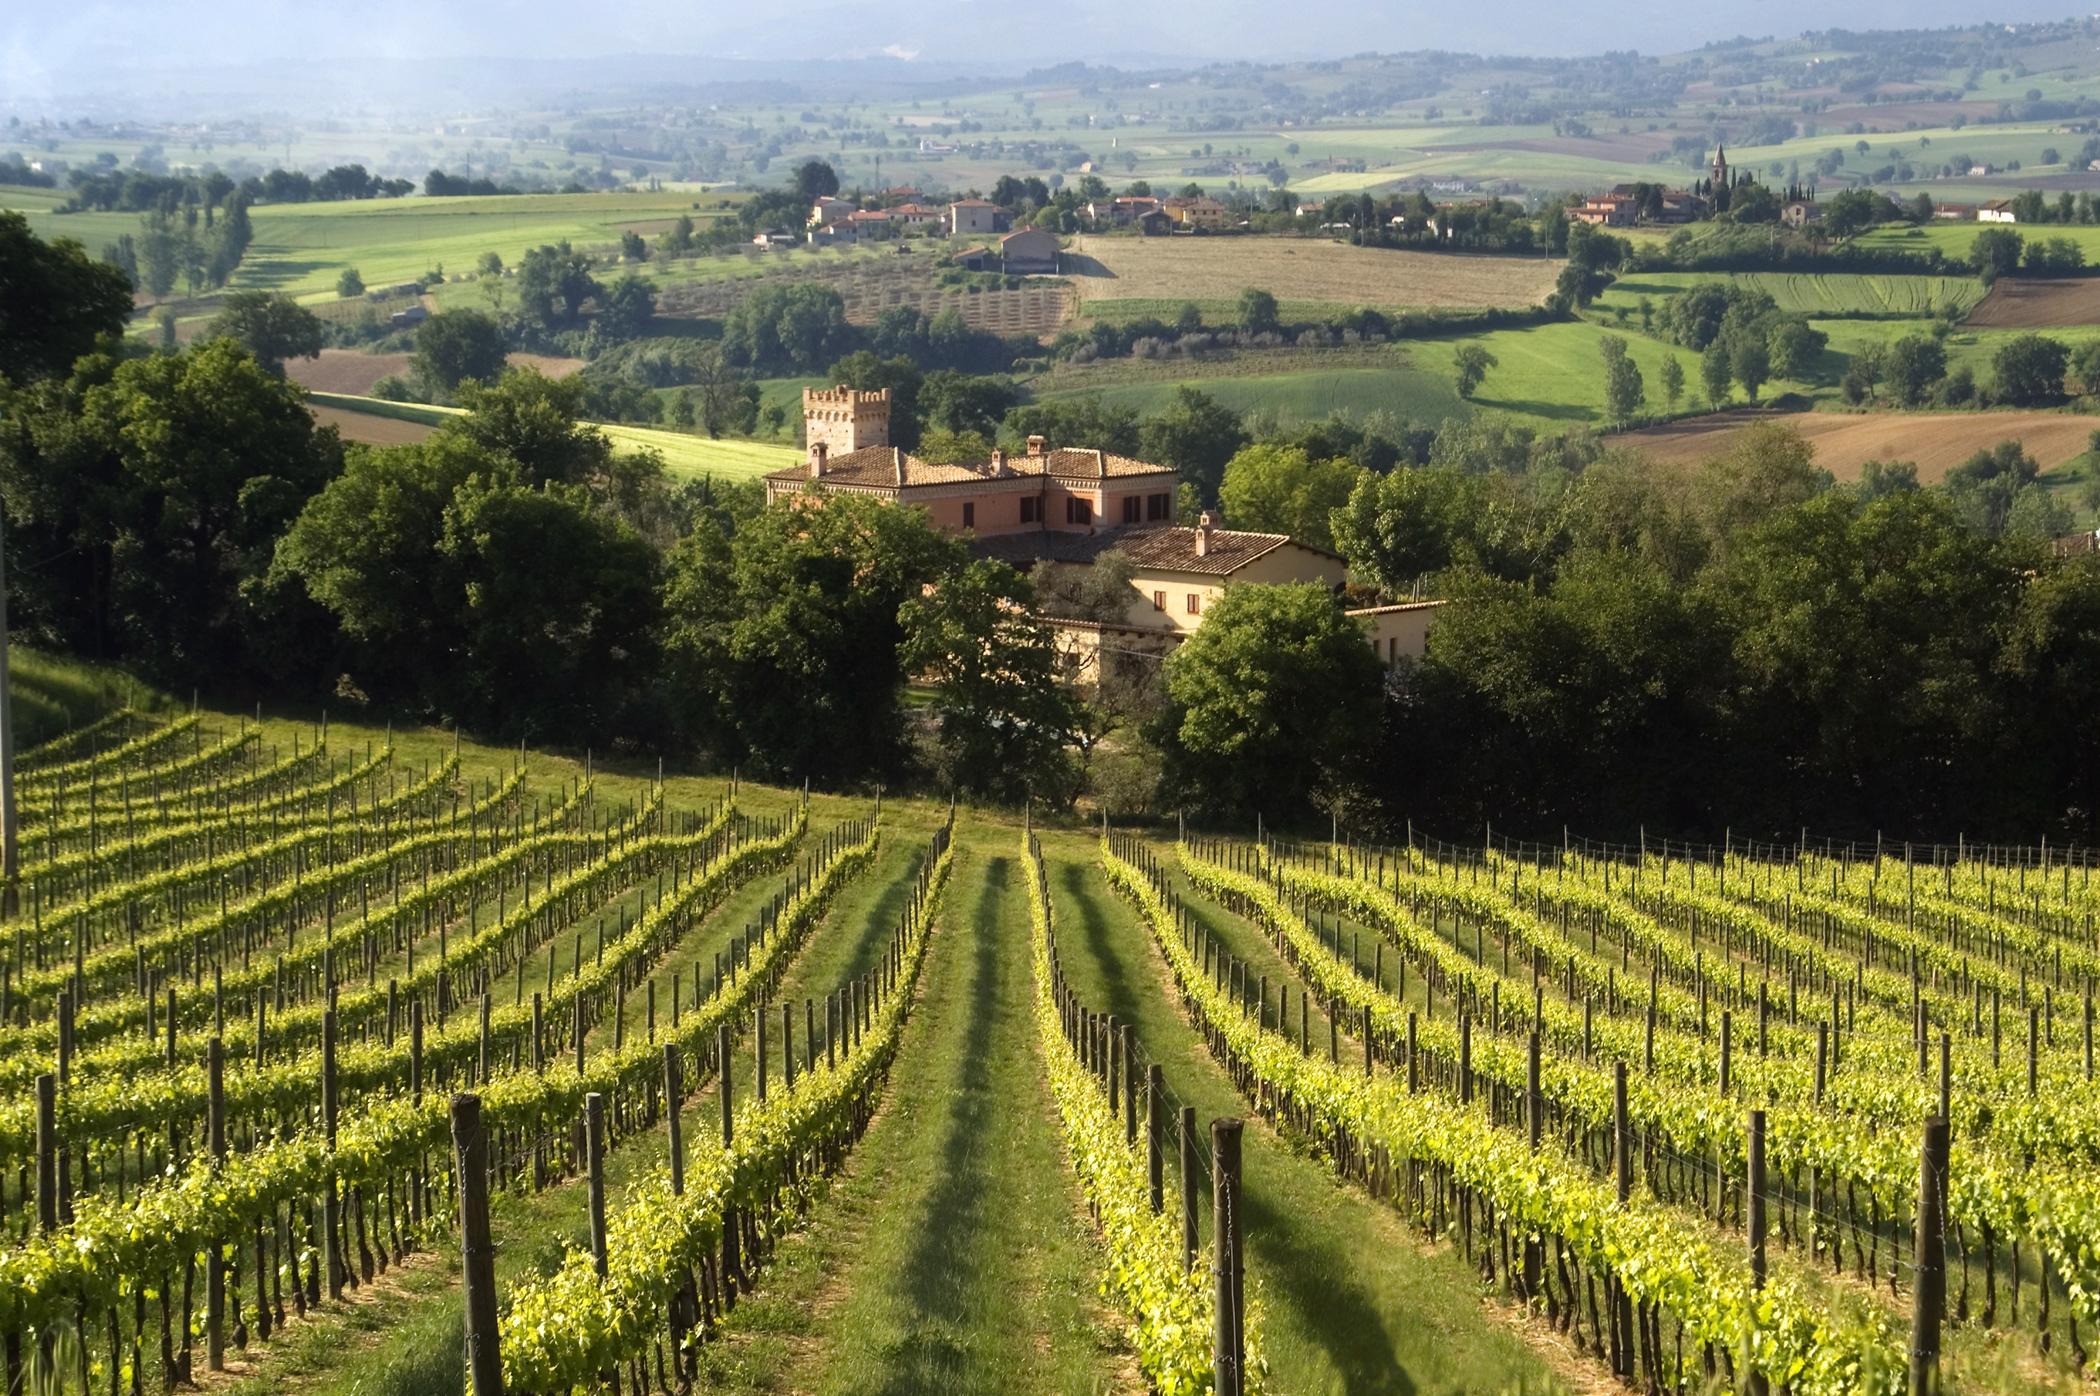 The Antonelli winery in Umbria